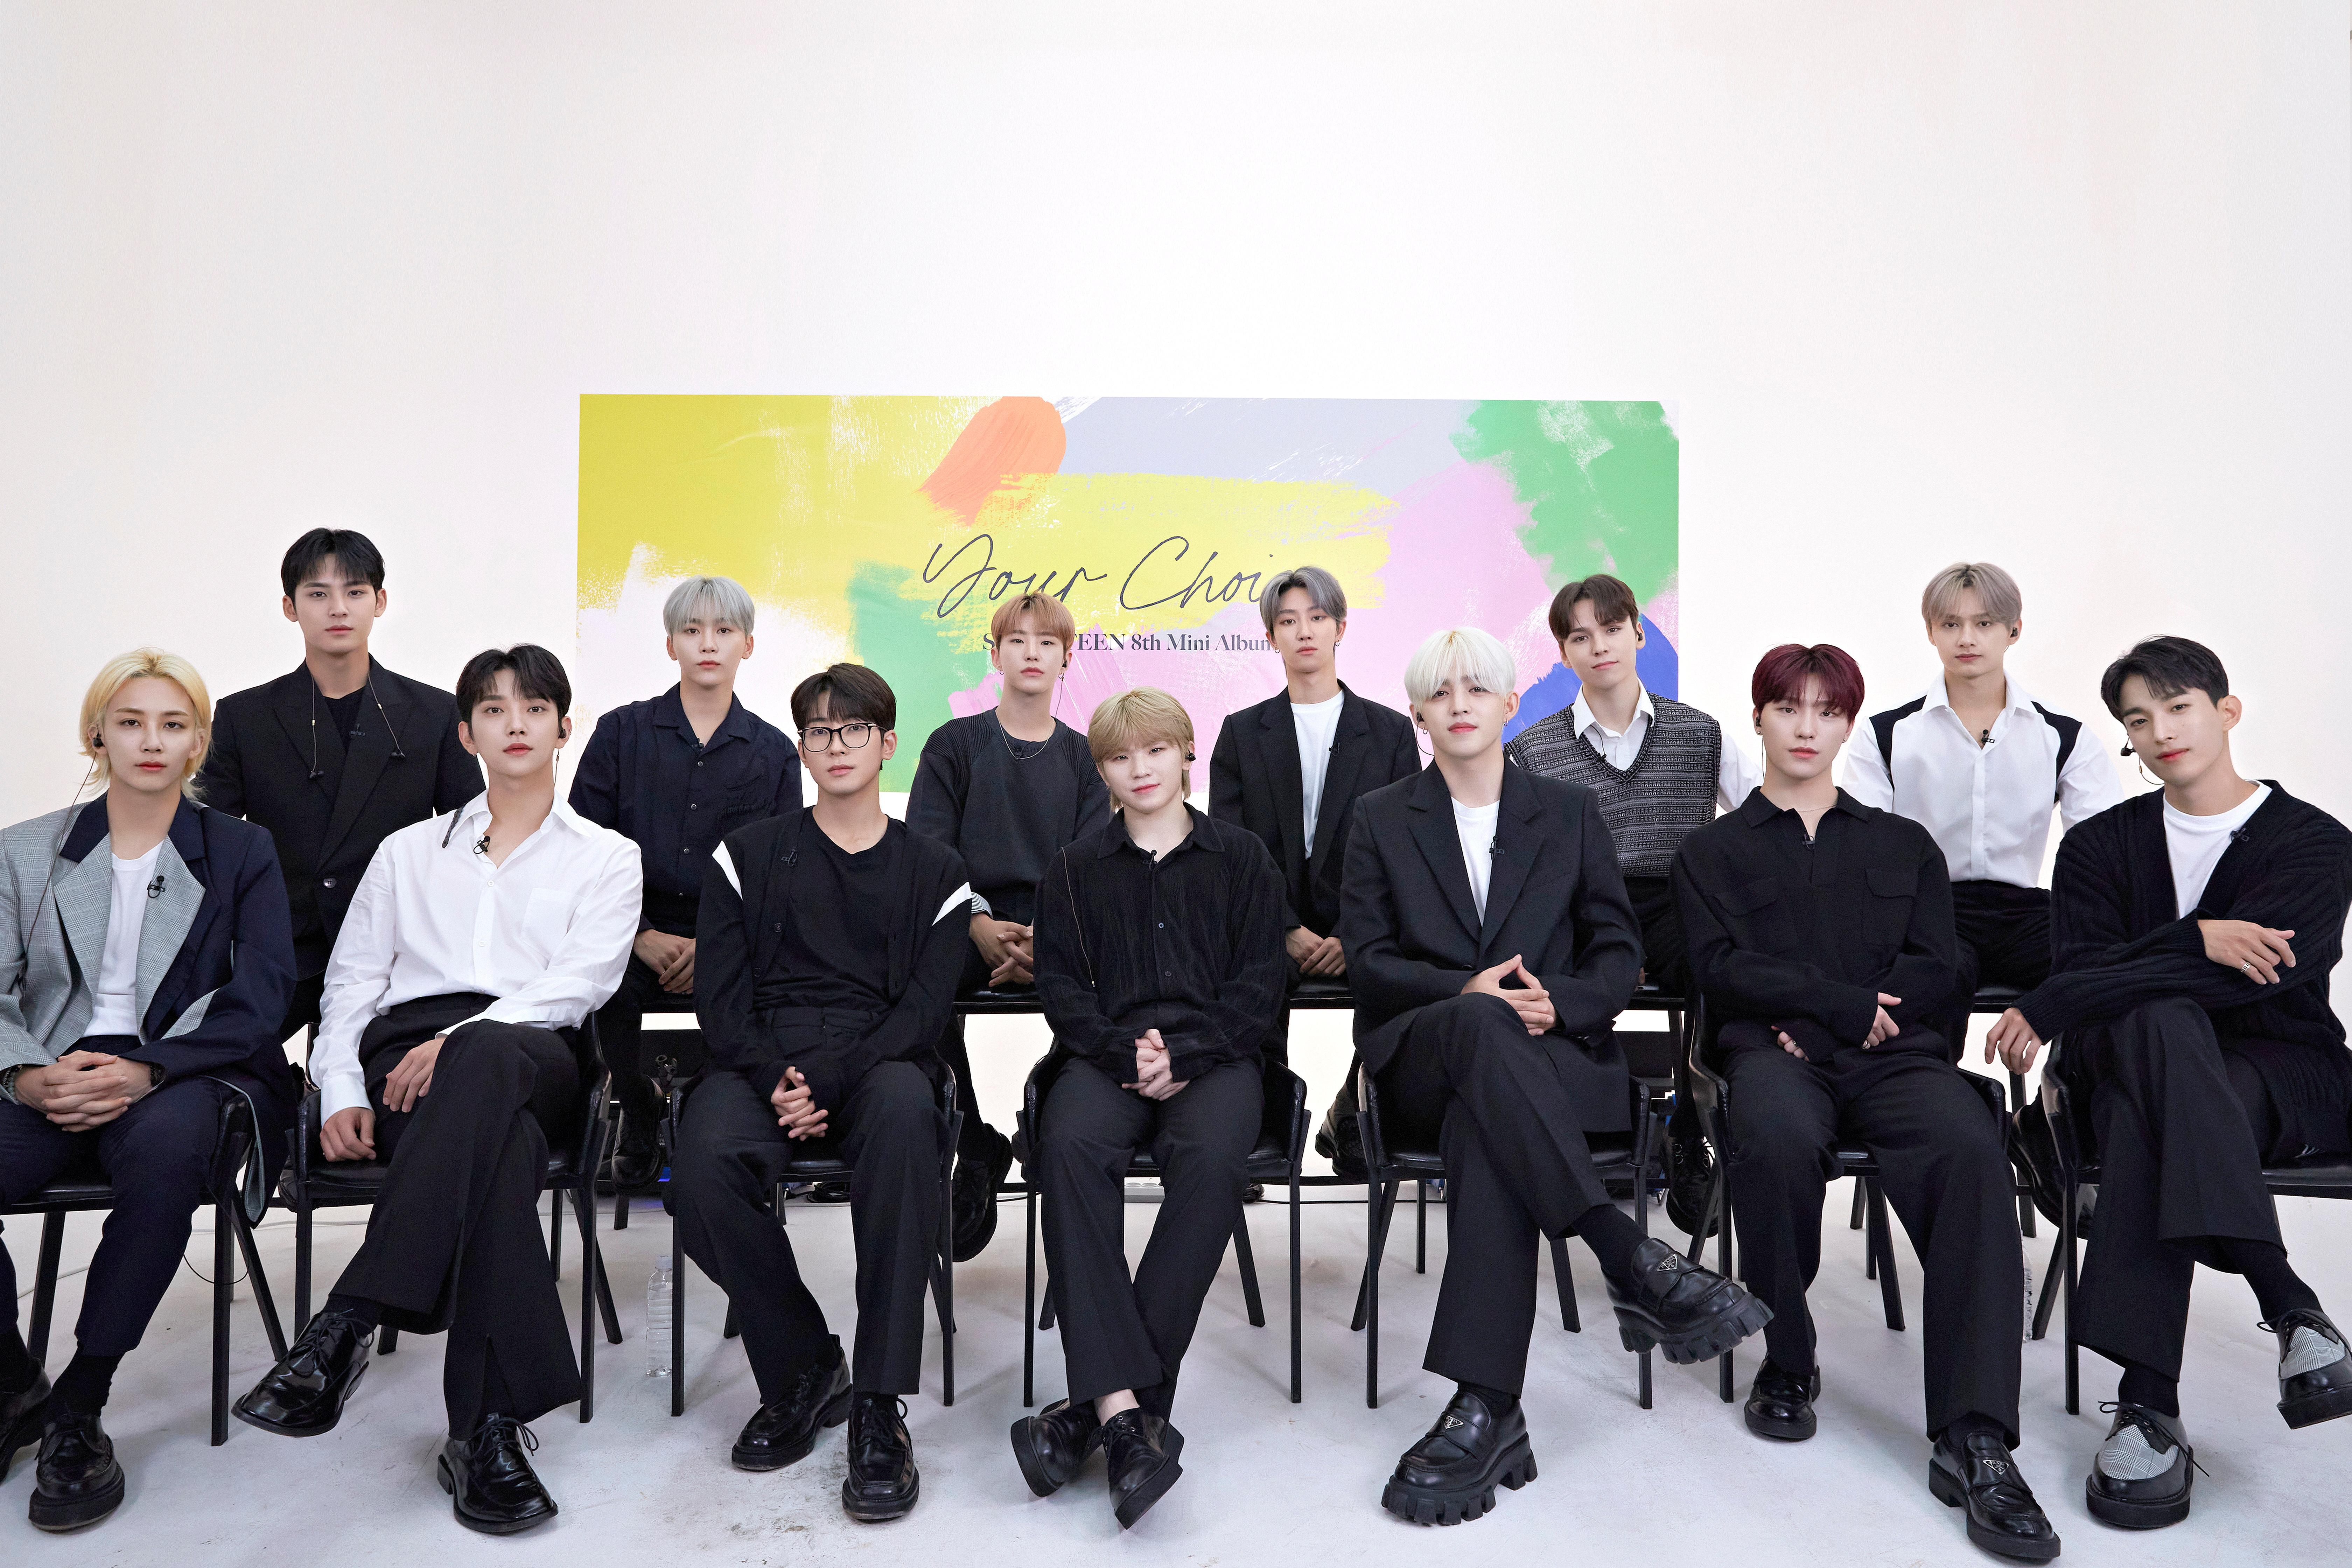 K-Pop group SEVENTEEN pose in this undated handout group photo. Top row (L to R) ? Mingyu, Seungkwan, Hoshi, The 8, Vernon, Jun. Bottom row (L to R) ? Jeonghan, Joshua, Wonwoo, Woozi, S.Coups, Dino, DK. Pledis Entertainment Co., Ltd./Handout via REUTERS